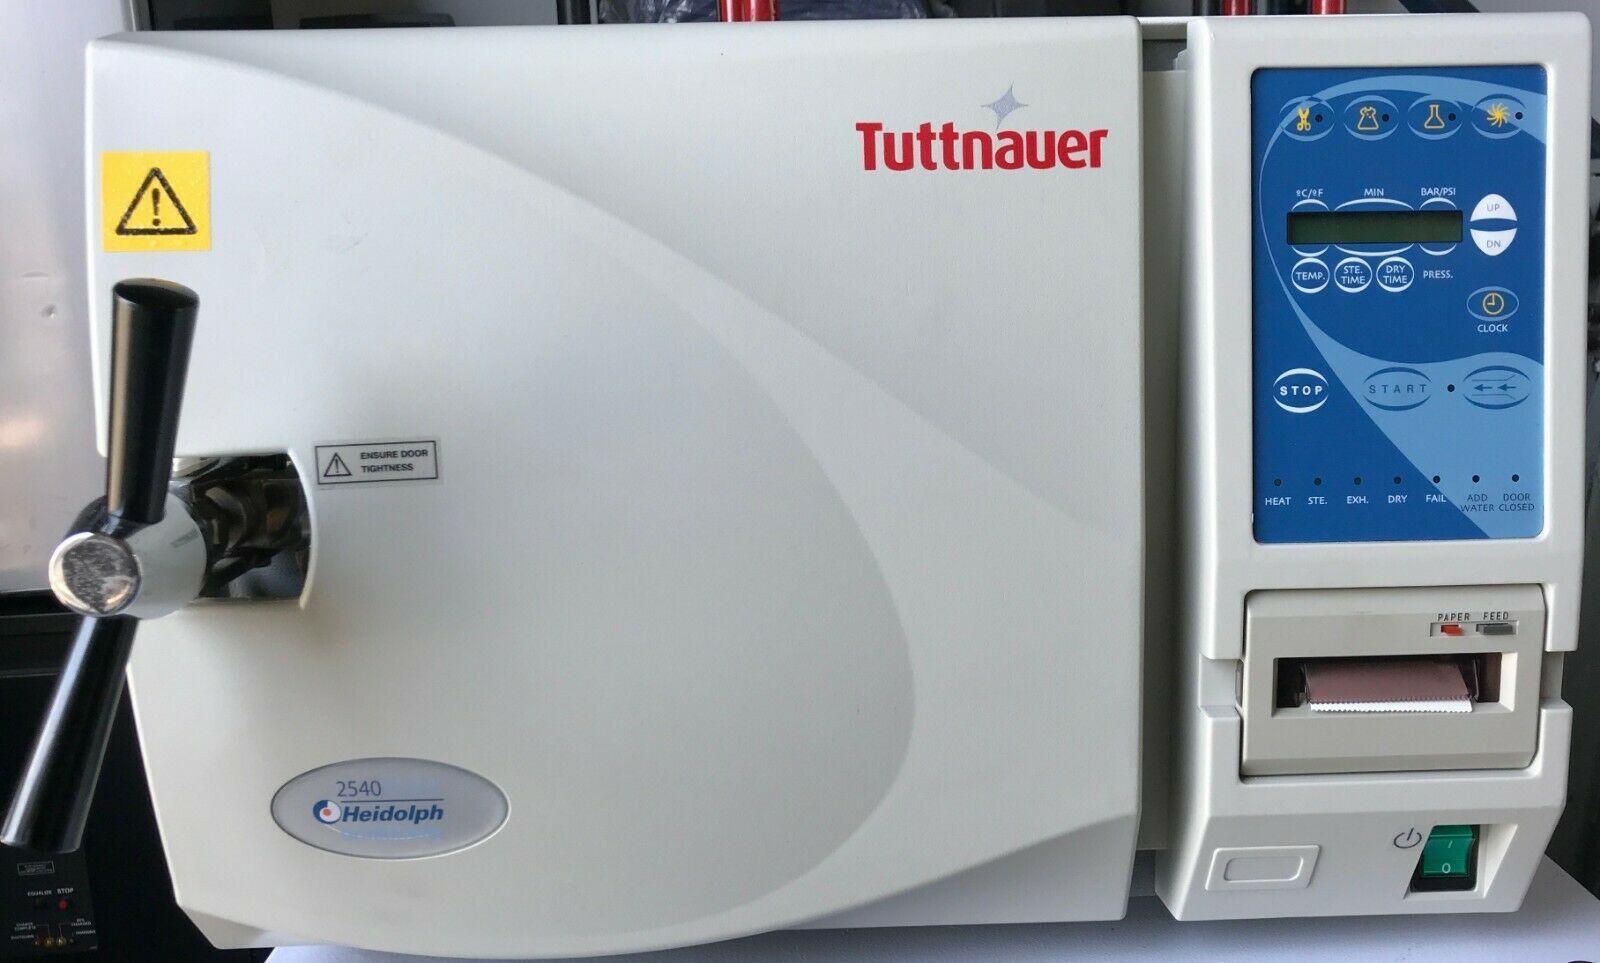 Tuttnauer 2540E Heidolph Autoclave Steam Sterilizer